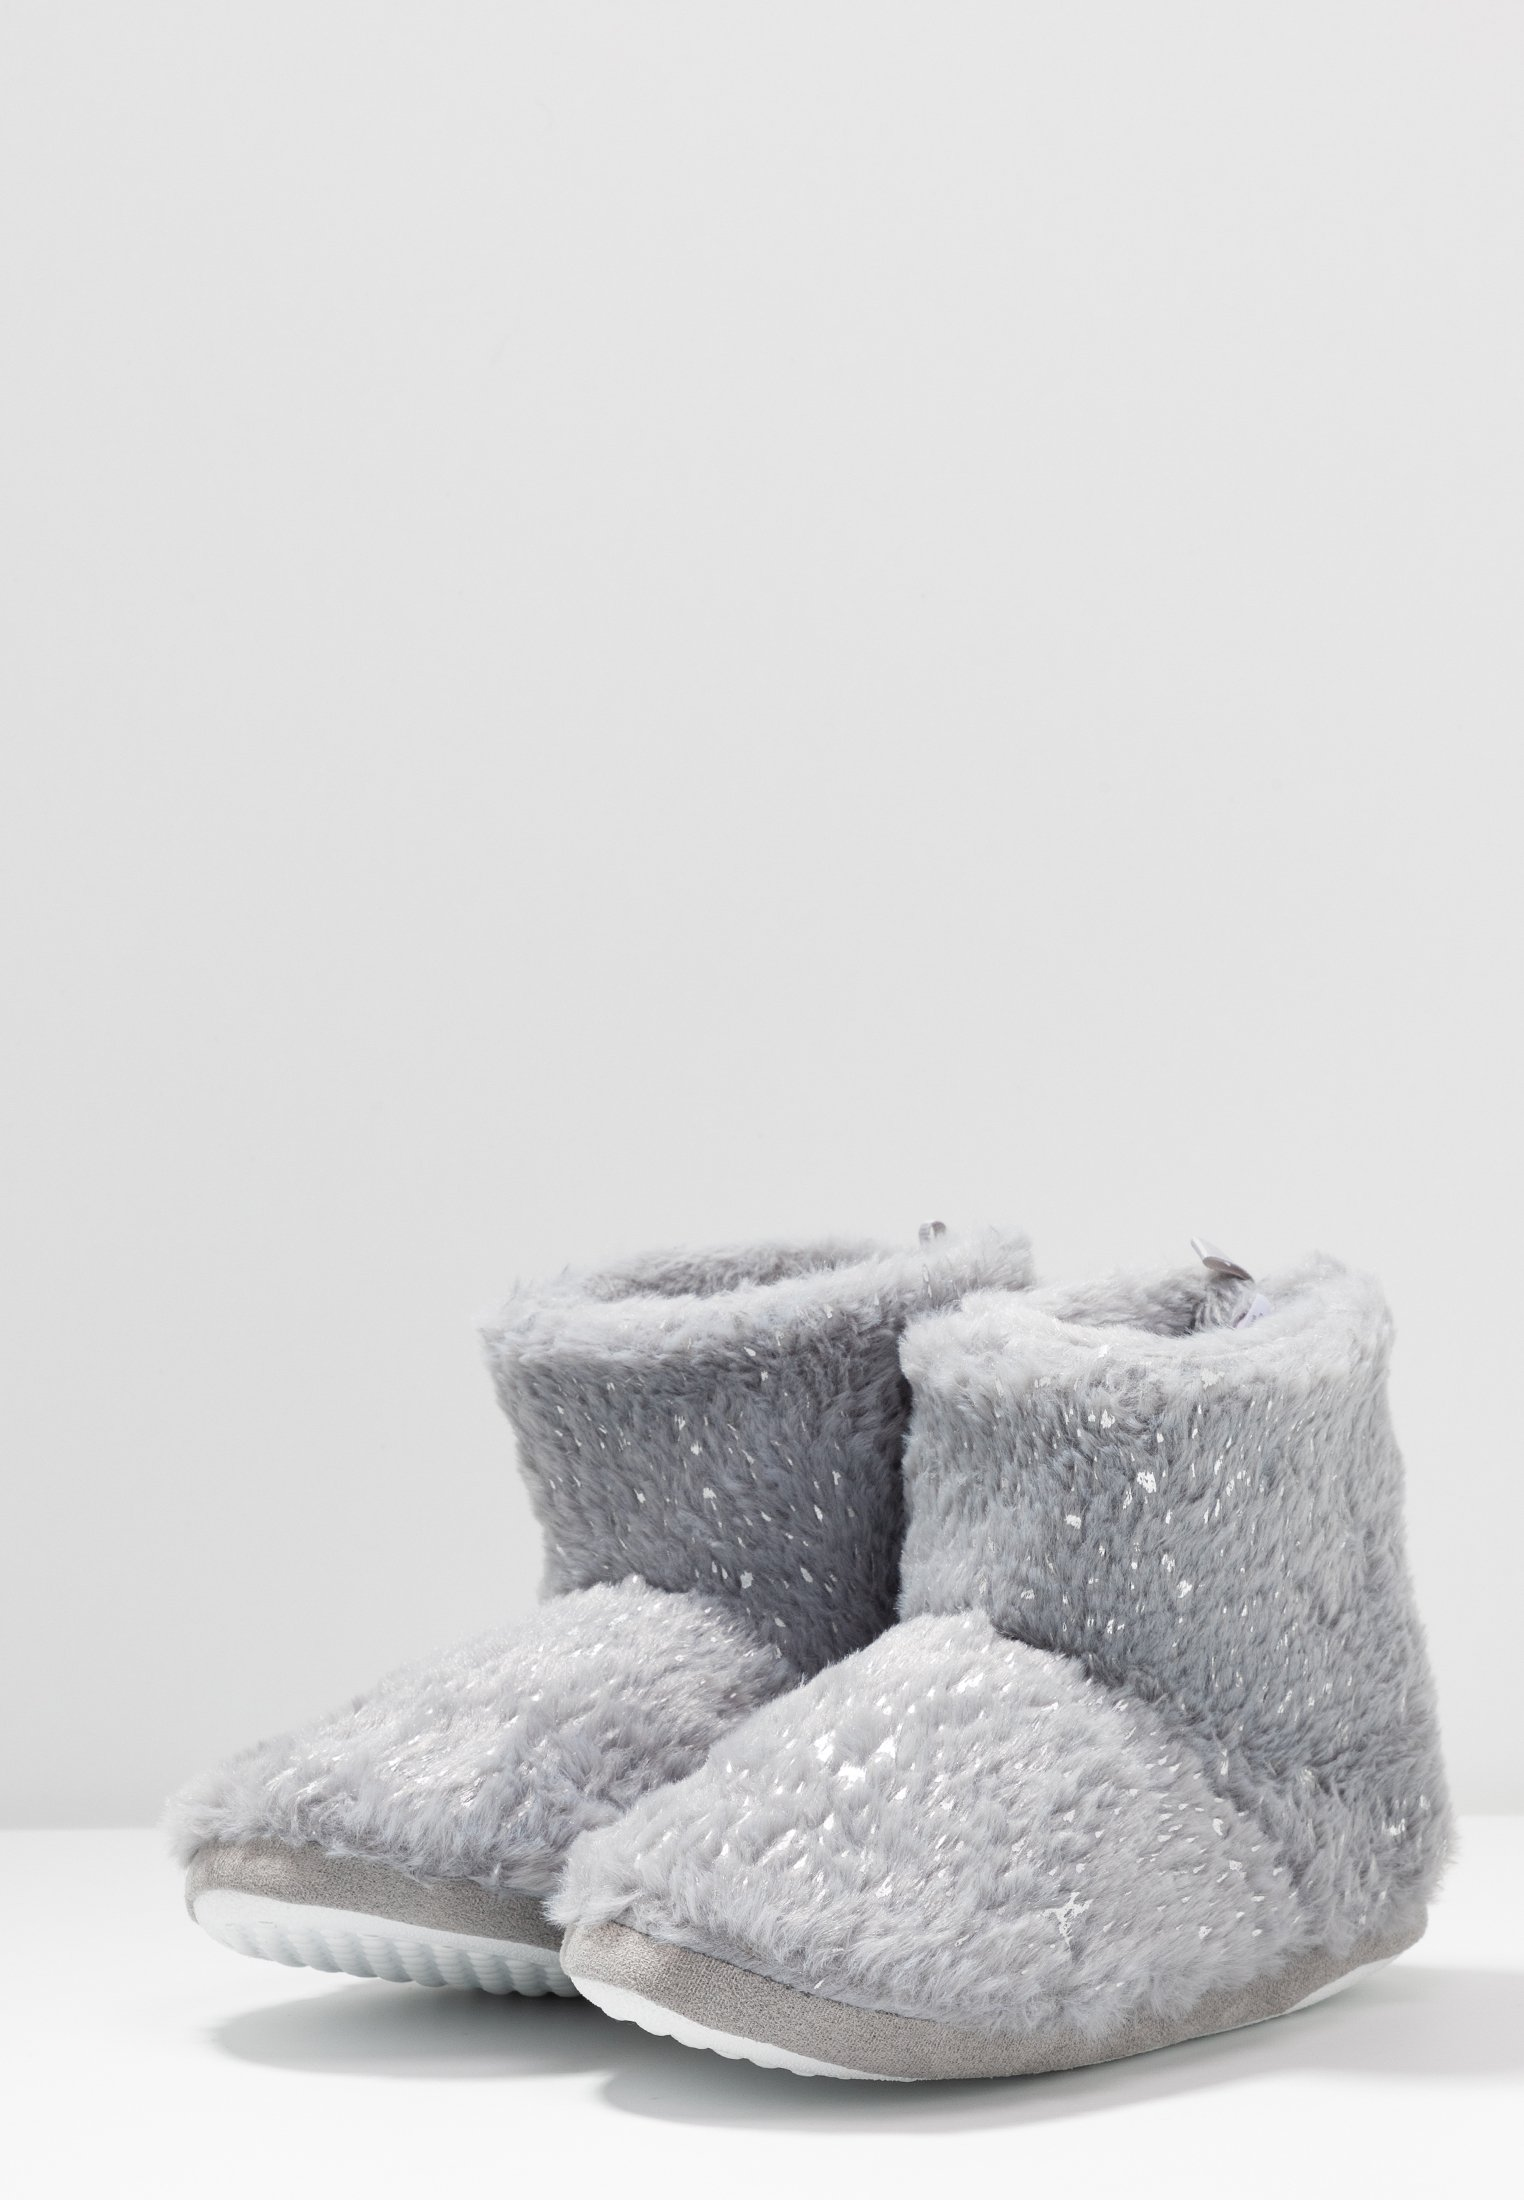 Dorothy Perkins FLECK BOOTIE - Hausschuh light grey